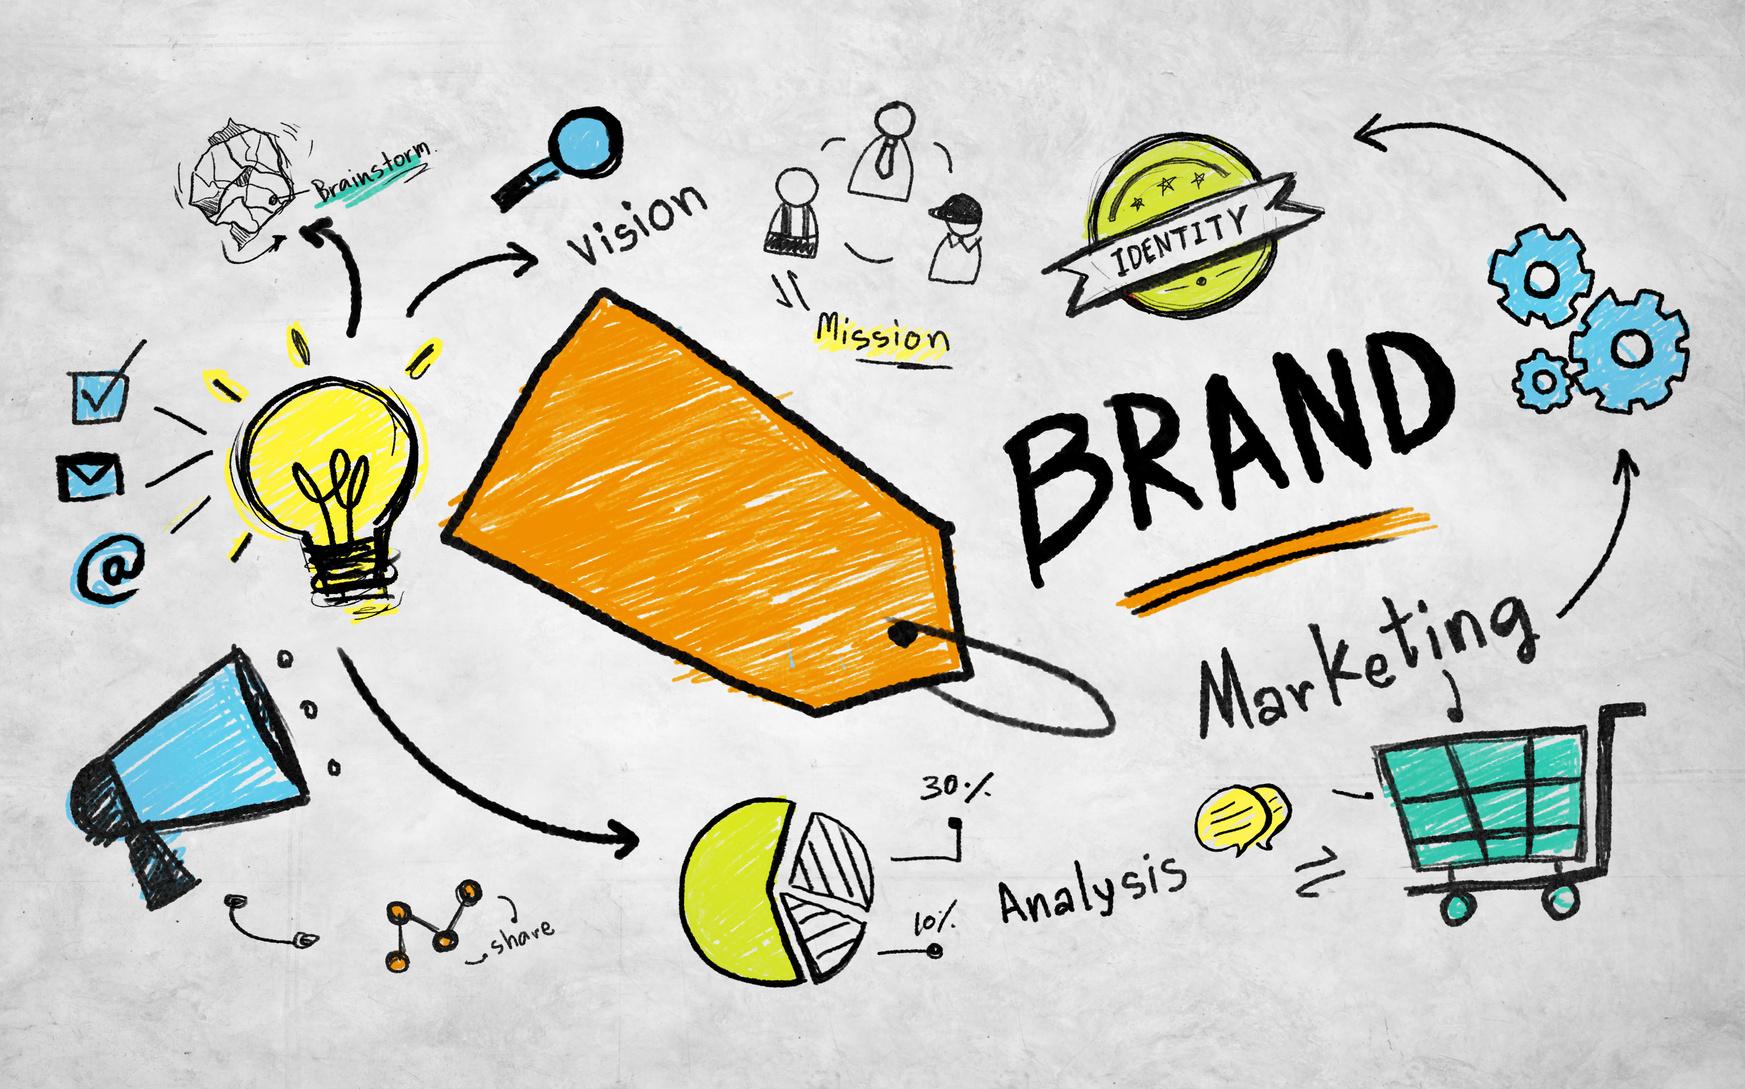 Woo Brand and Model Plugin for WordPress